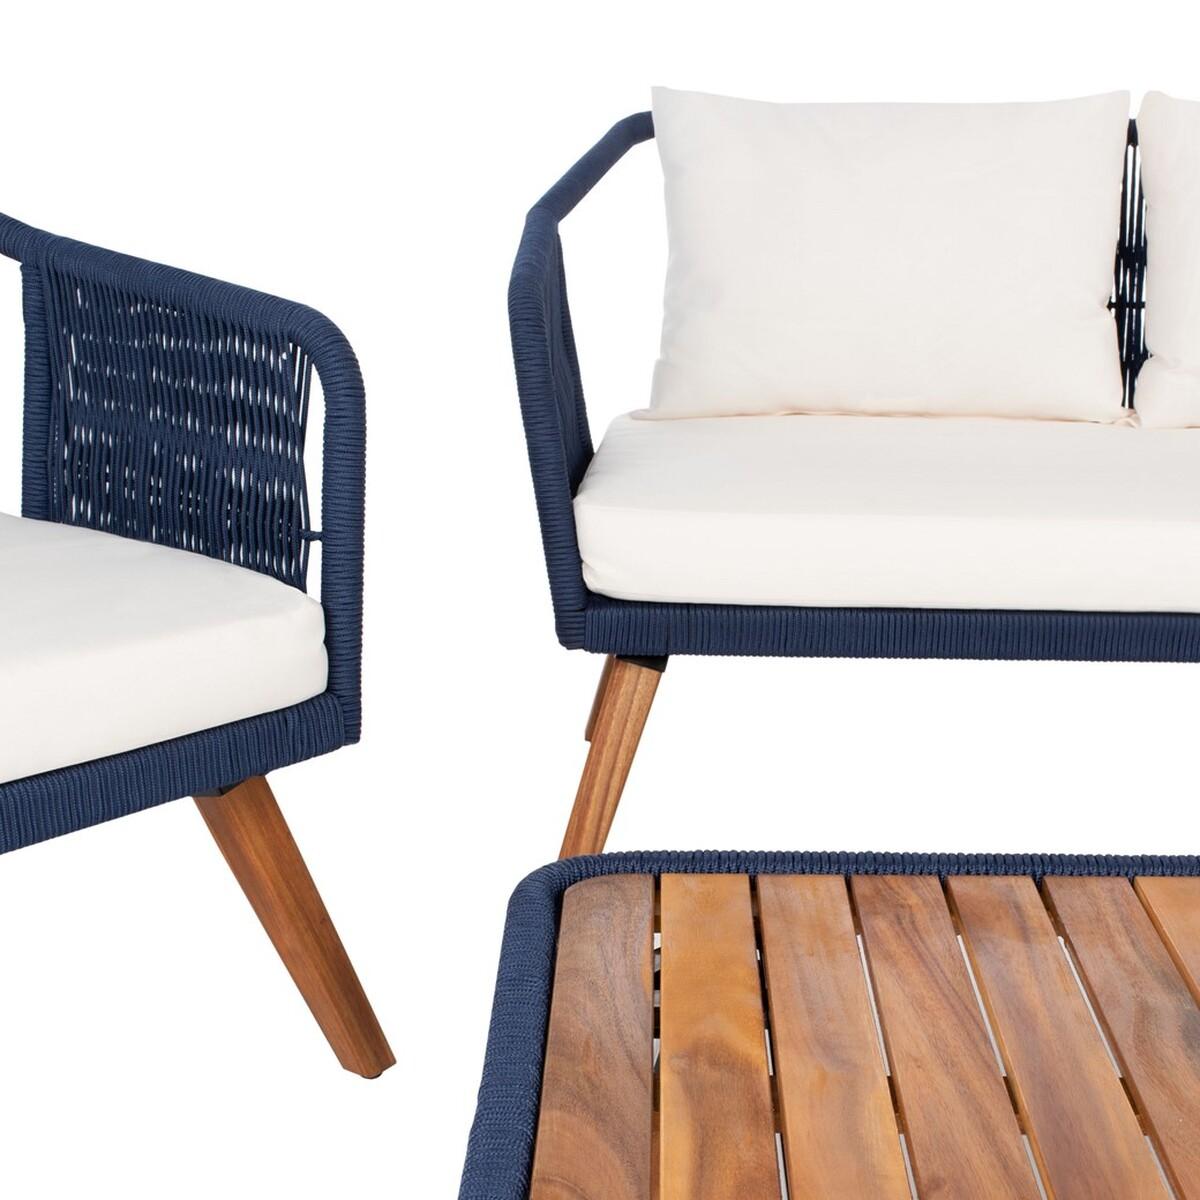 PAT7049E Patio Sets - 4 Piece - Furniture by Safavieh on Safavieh Raldin id=20300